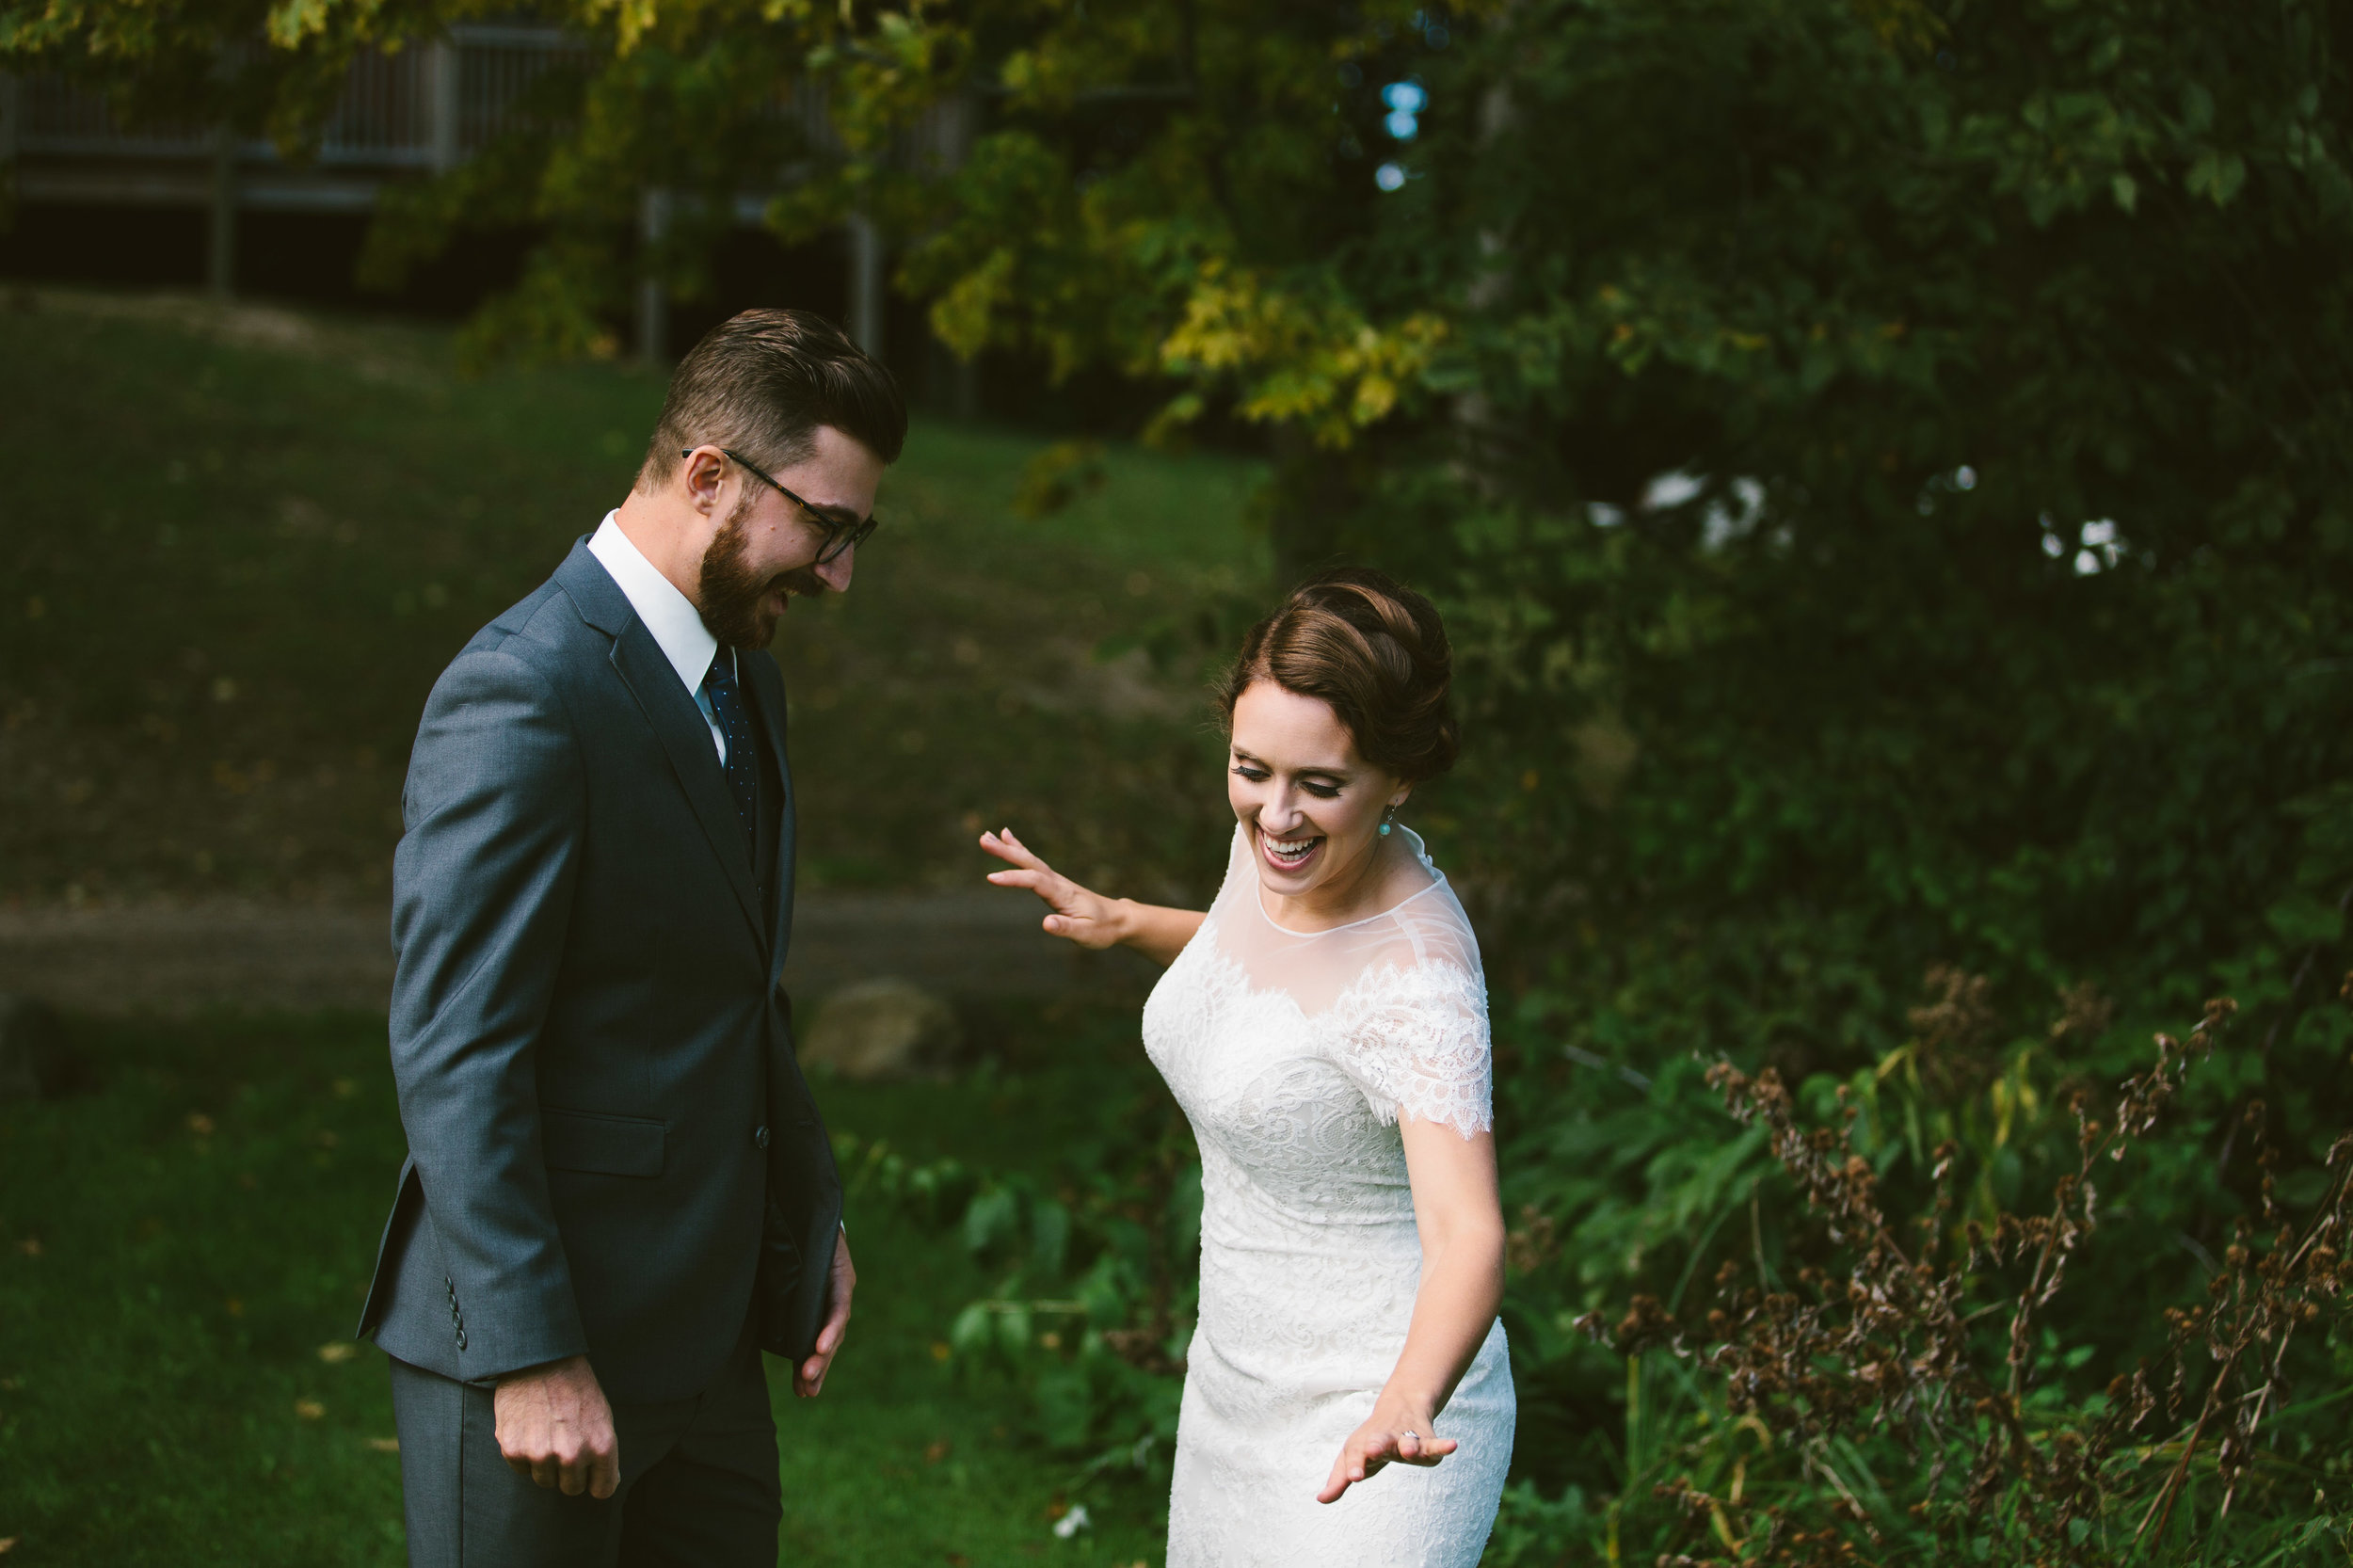 grand_rapids_wedding_rockford_wedding_richard_app_gallery_wedding_grand_rapids_wedding_photographer_summer_wedding_wabasis_lake_park_wedding_rustic_wedding-15.jpg